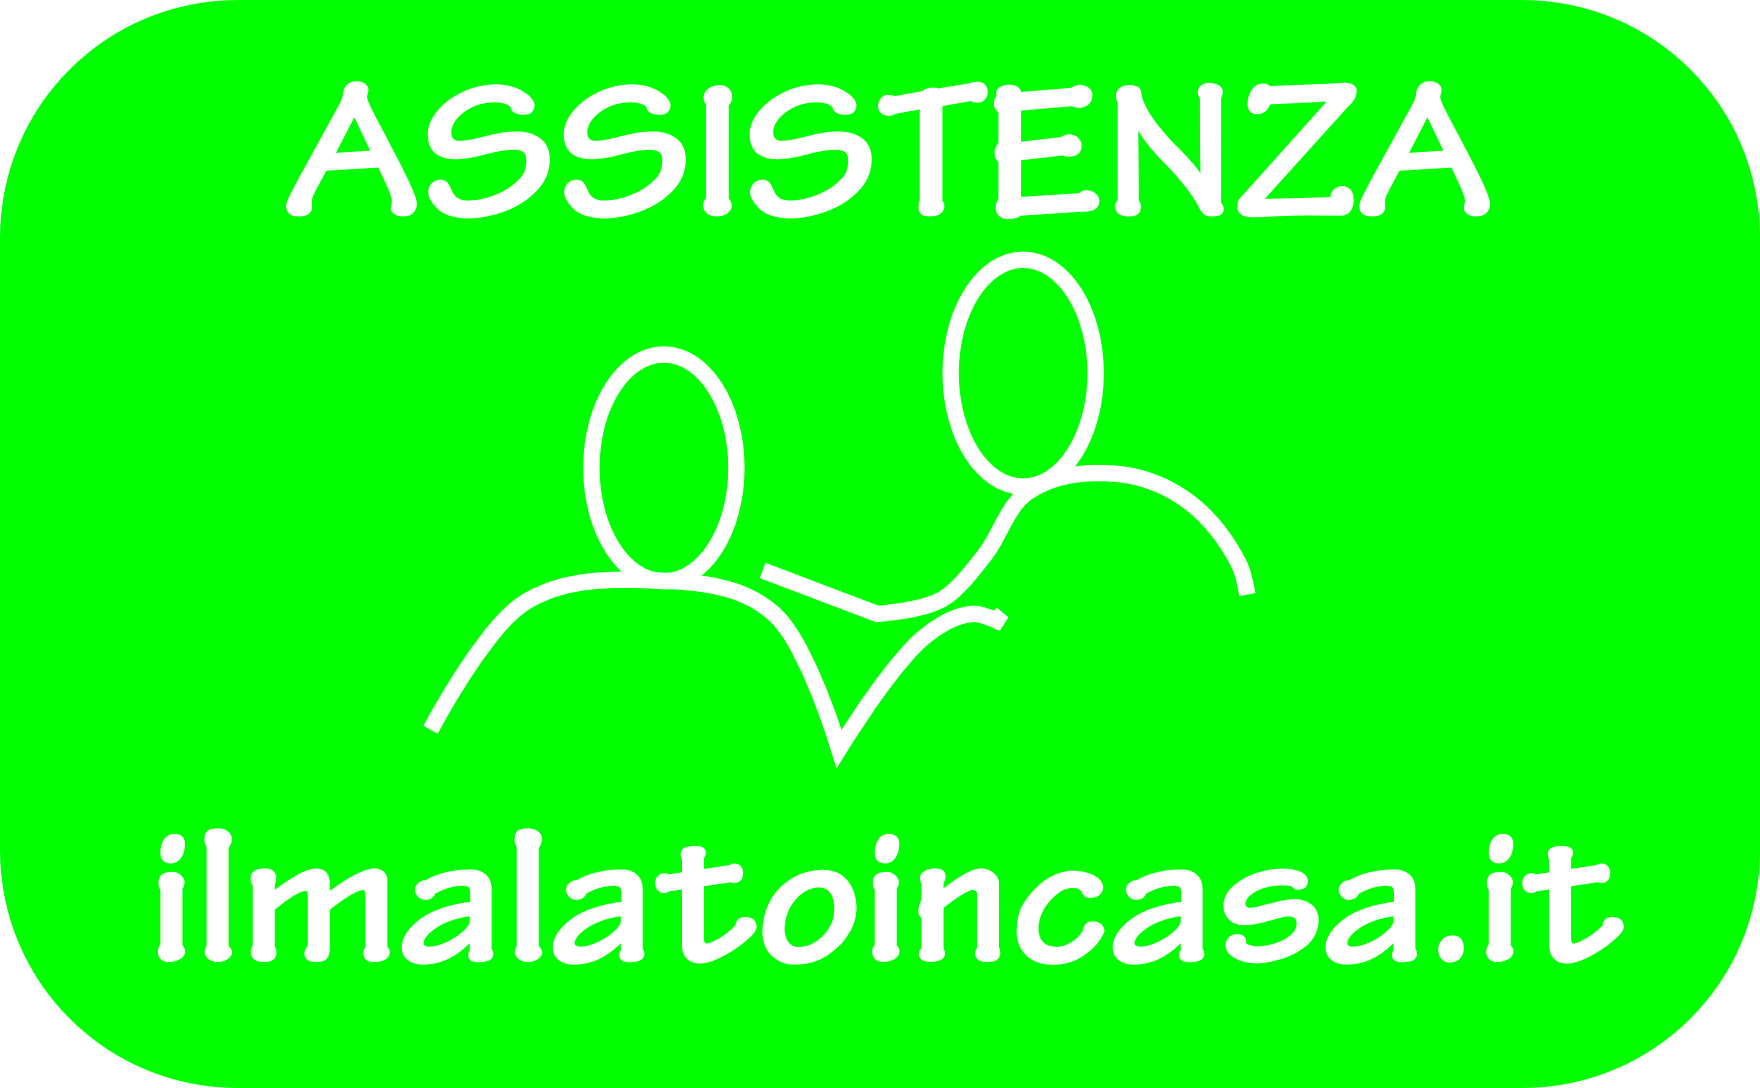 bottone verde assistenza